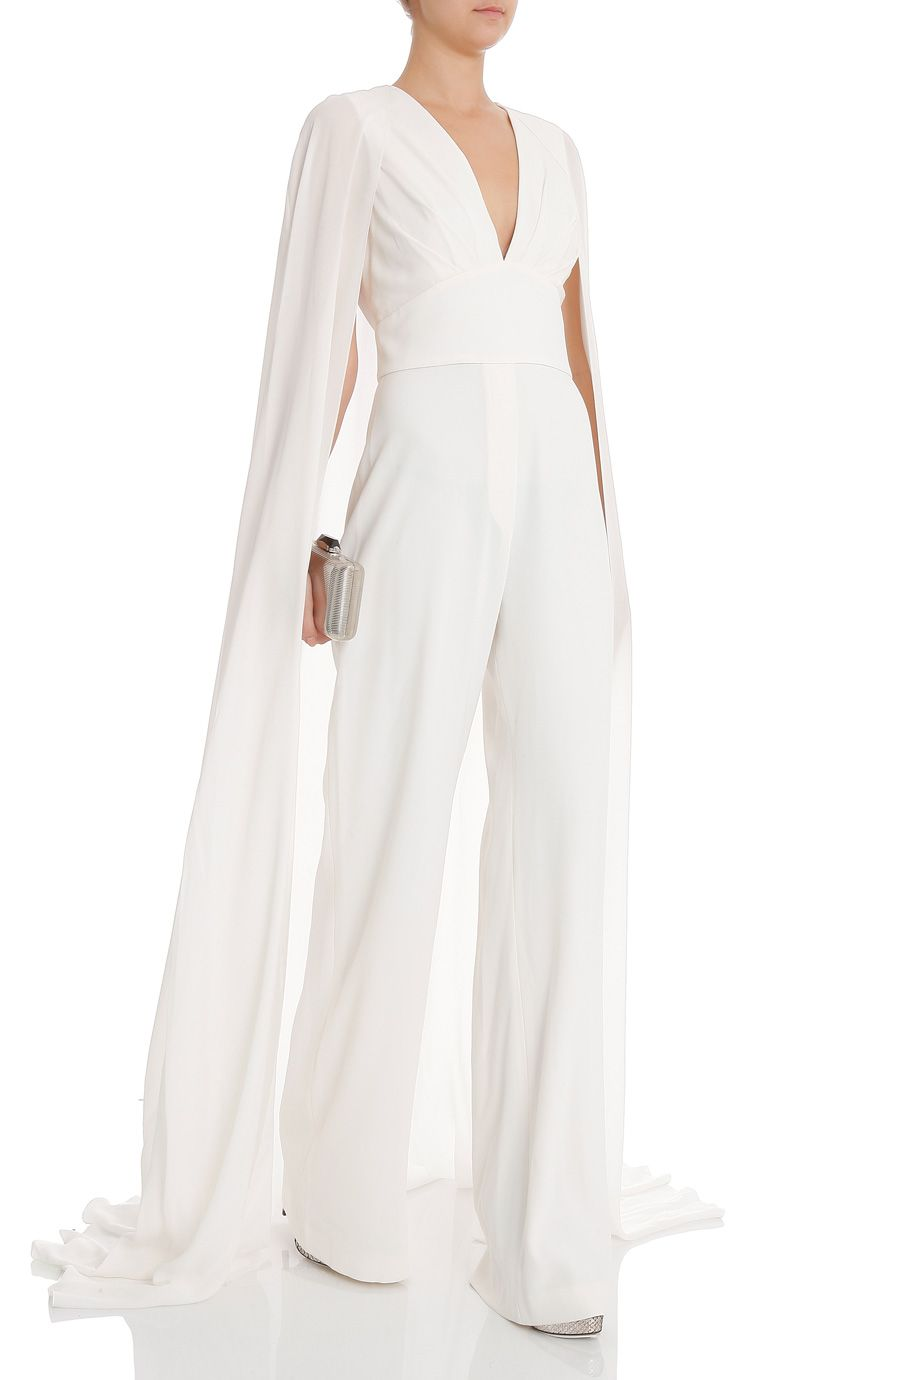 Image Result For Jumpsuit With Train Bridal Jumpsuit Wedding Pants